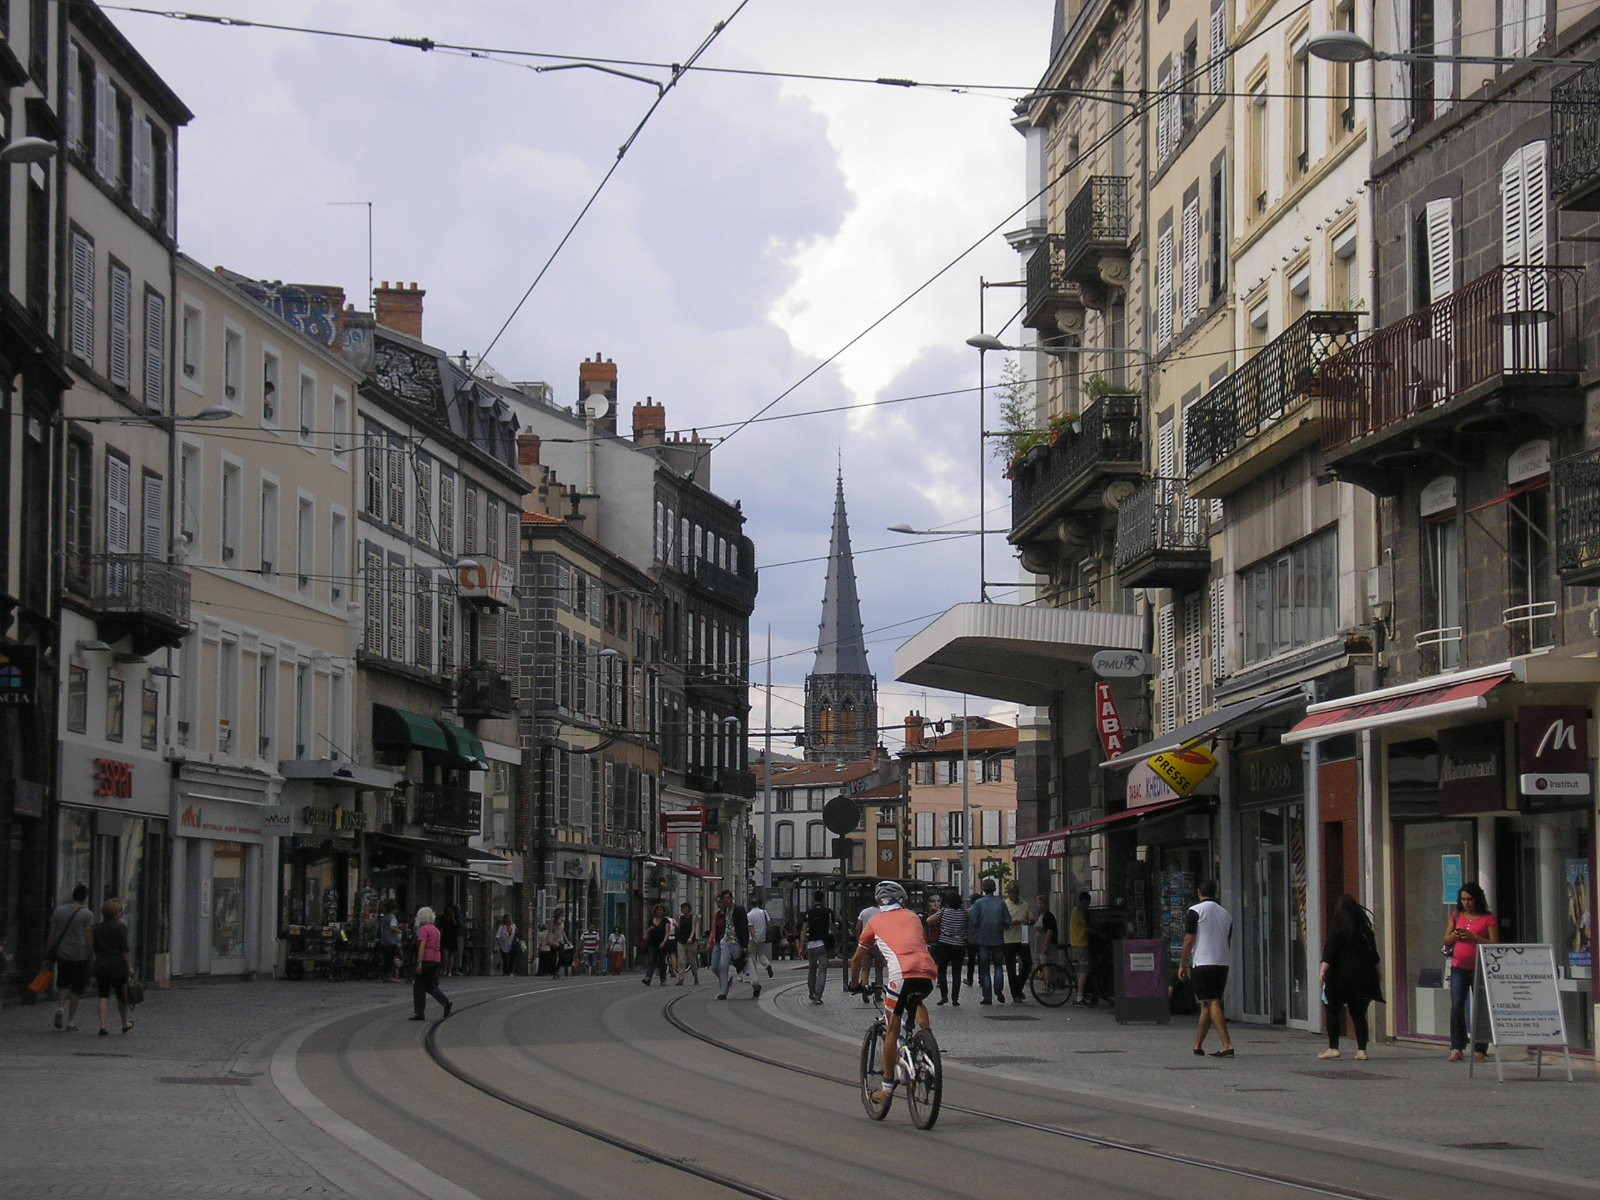 Европа : Клермон-Ферран - город на вулкане